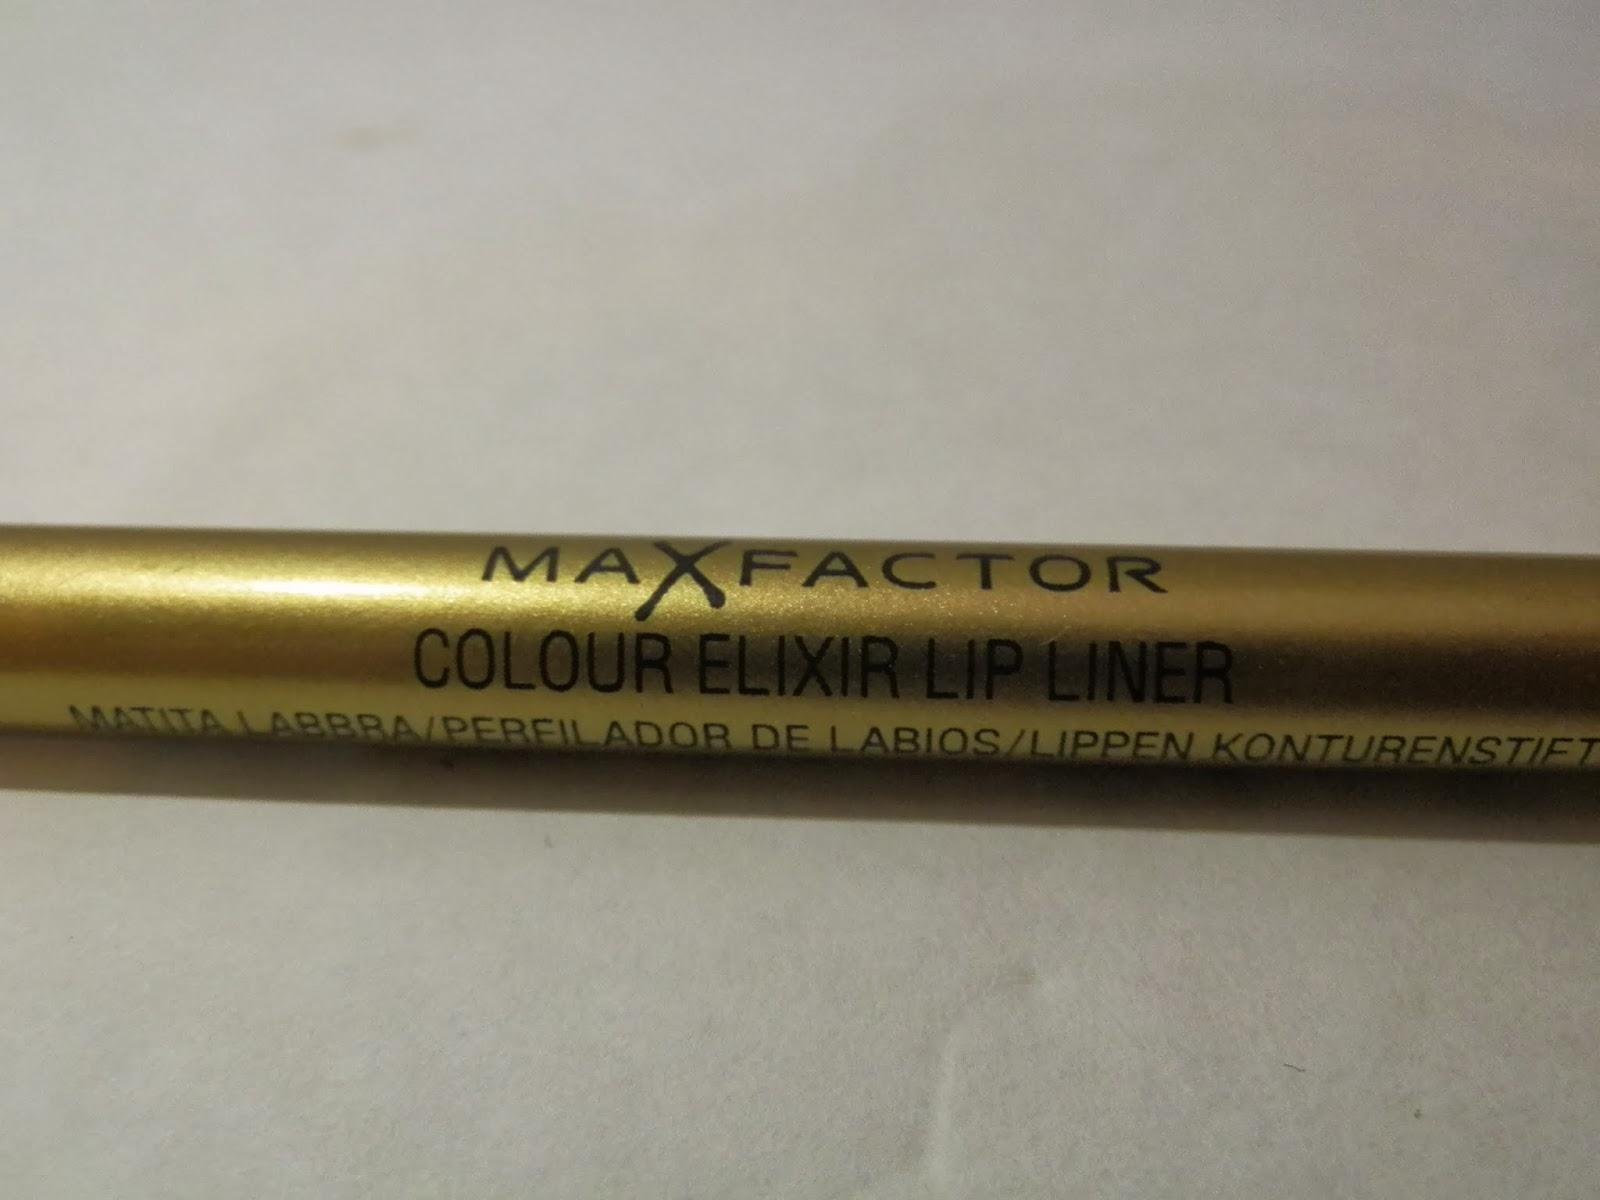 "<img alt=""max factor"" src=""max_factor_colour_elixir_lip_liner.jpg"" >"